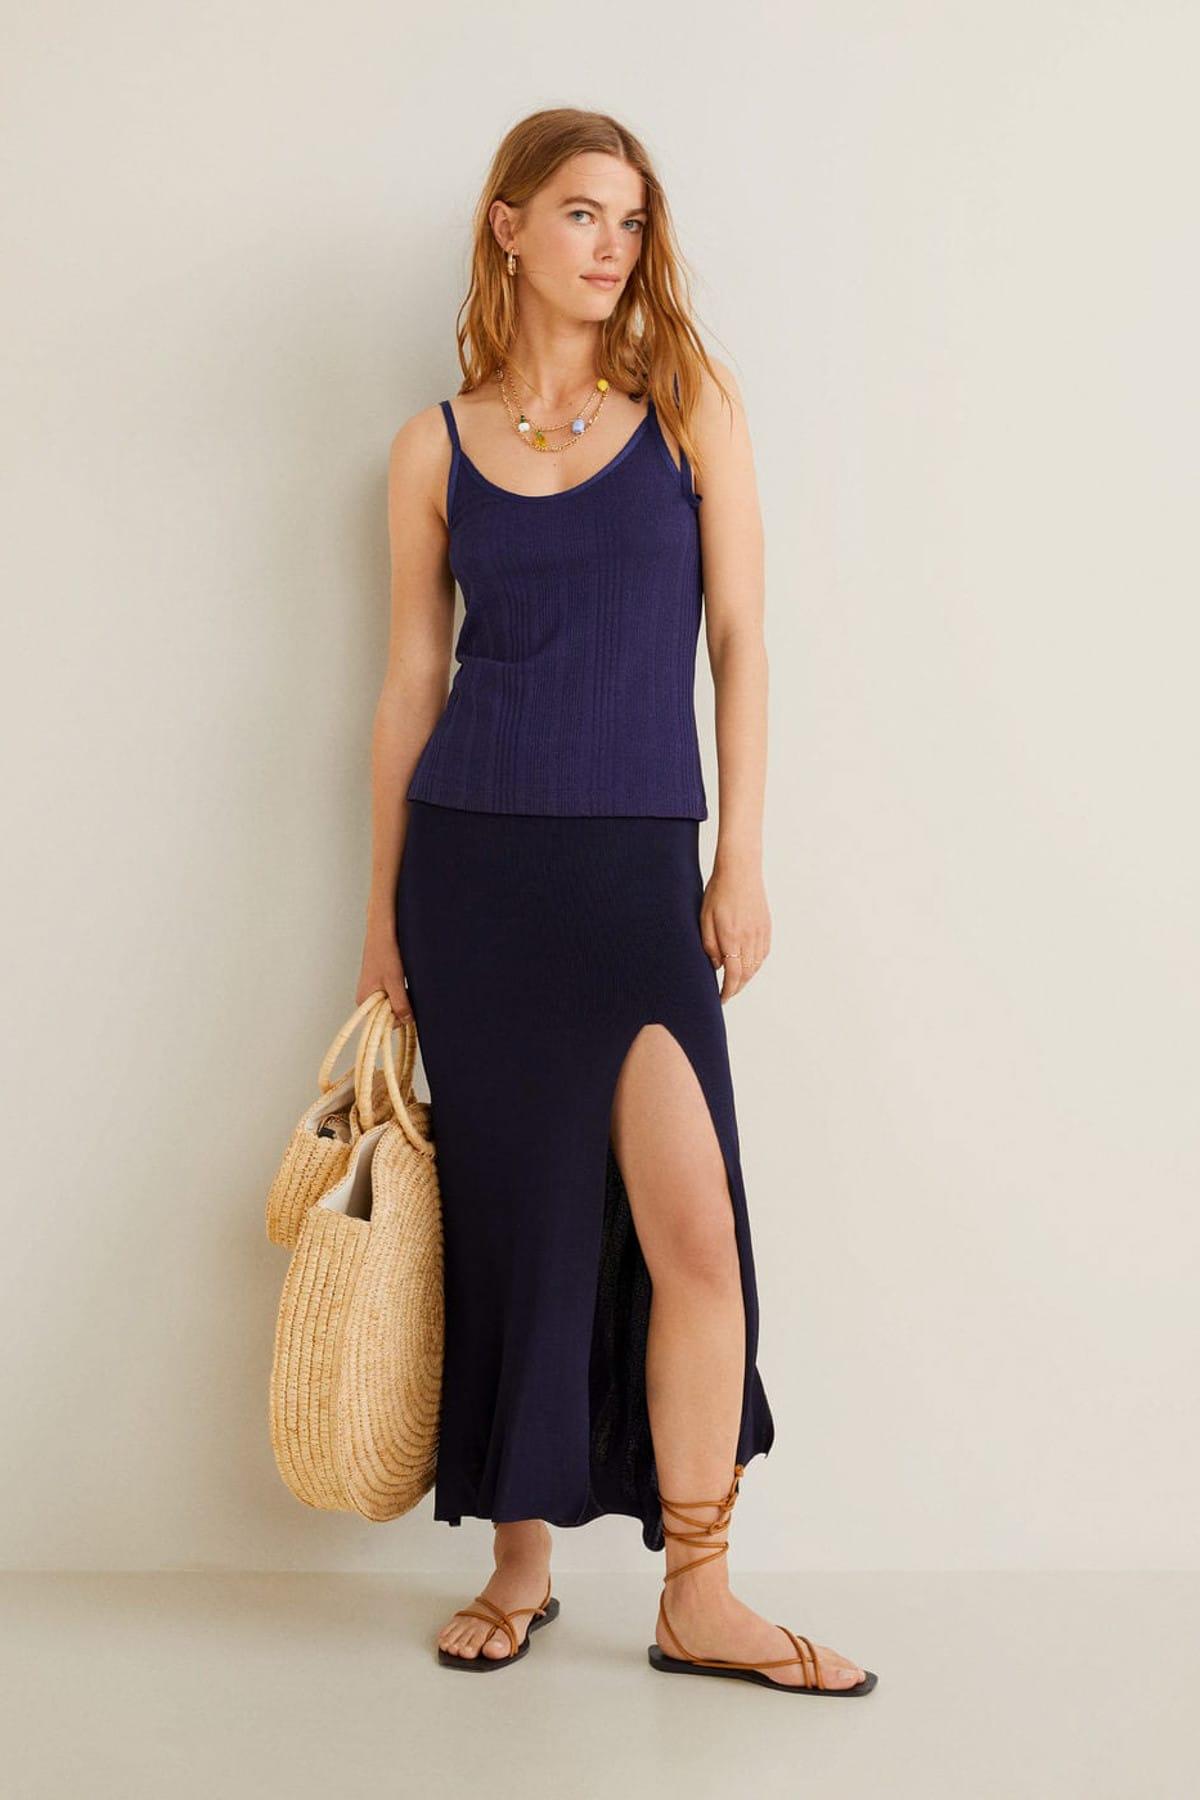 Mango Kadın Mavi Lastikli Dokuma Askılı Üst 43039088